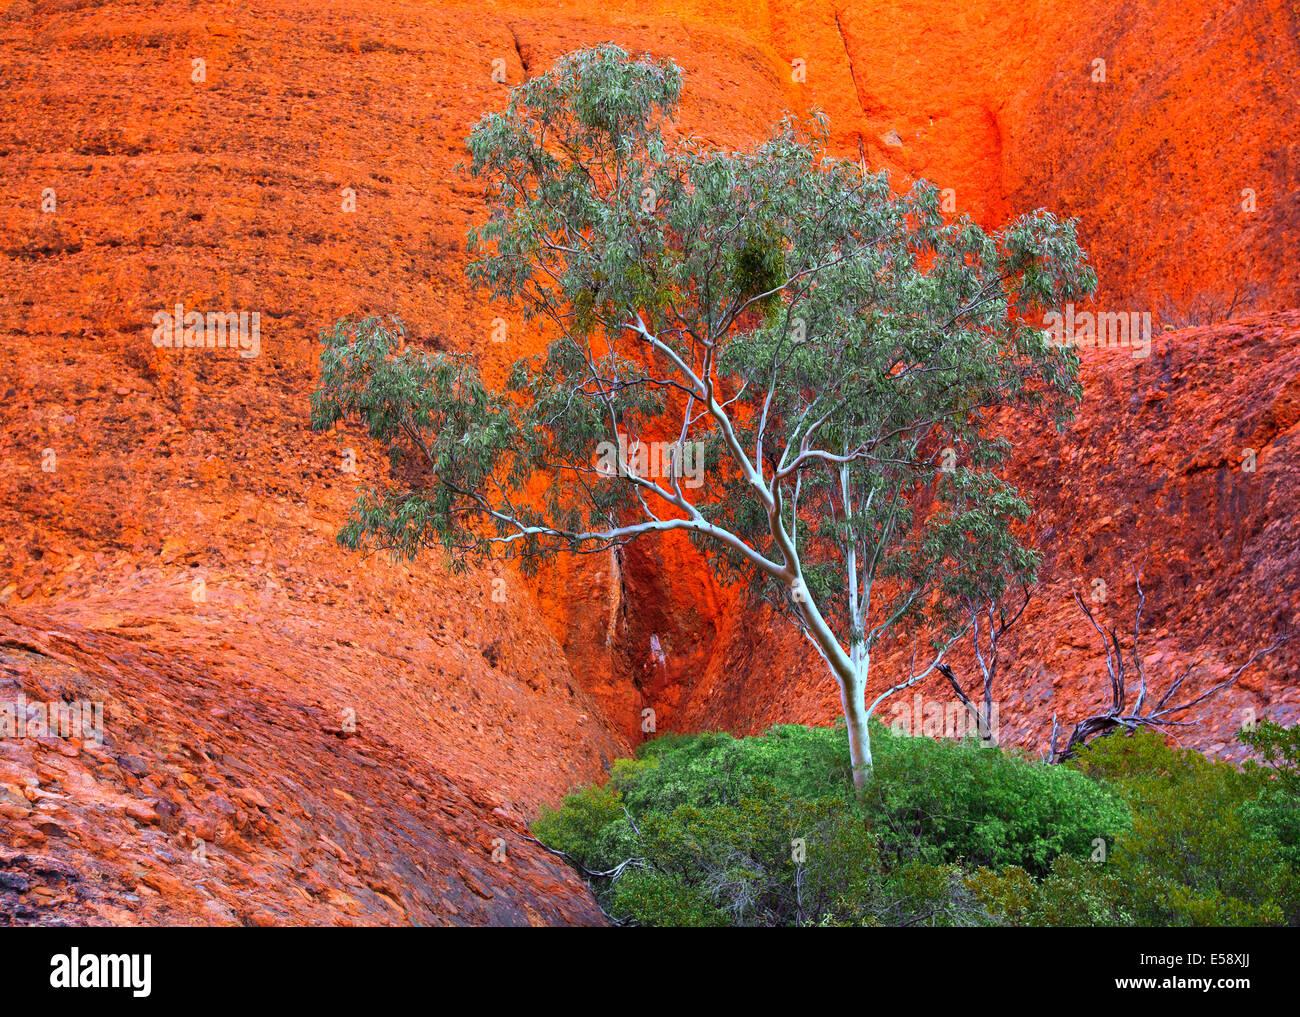 Central Australia Northern Territory Olgas Kata Juta - Stock Image